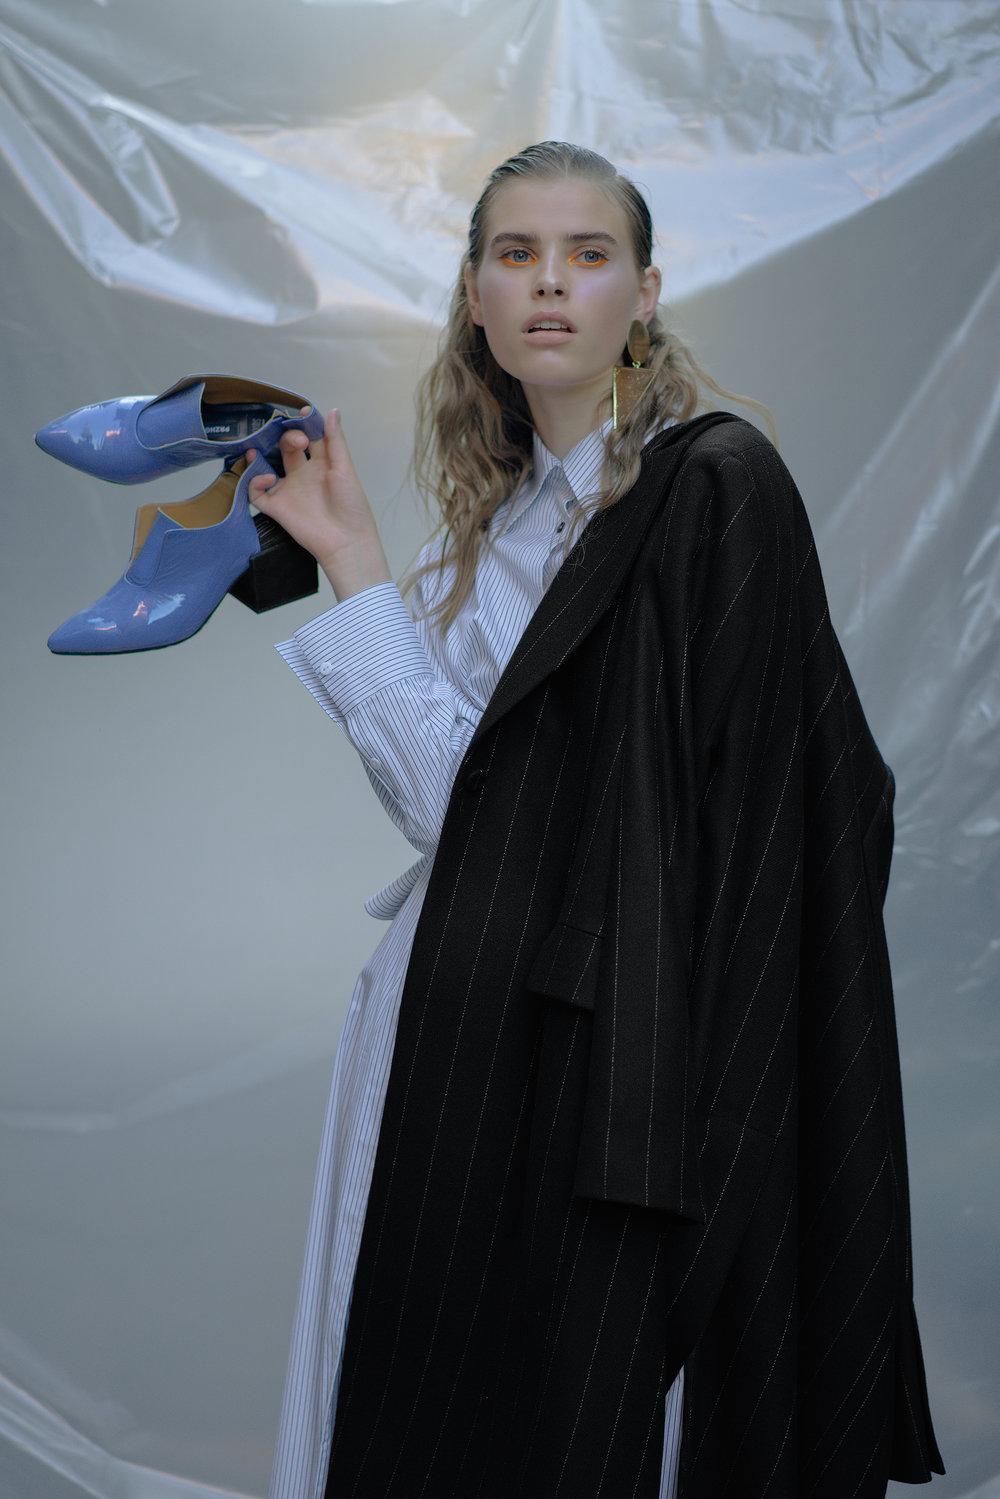 Coat BEVZA Shirt dress CHAKSHYN Earring Stylist's own Shoes PRZHONSKAYA & ALI SAULIDI